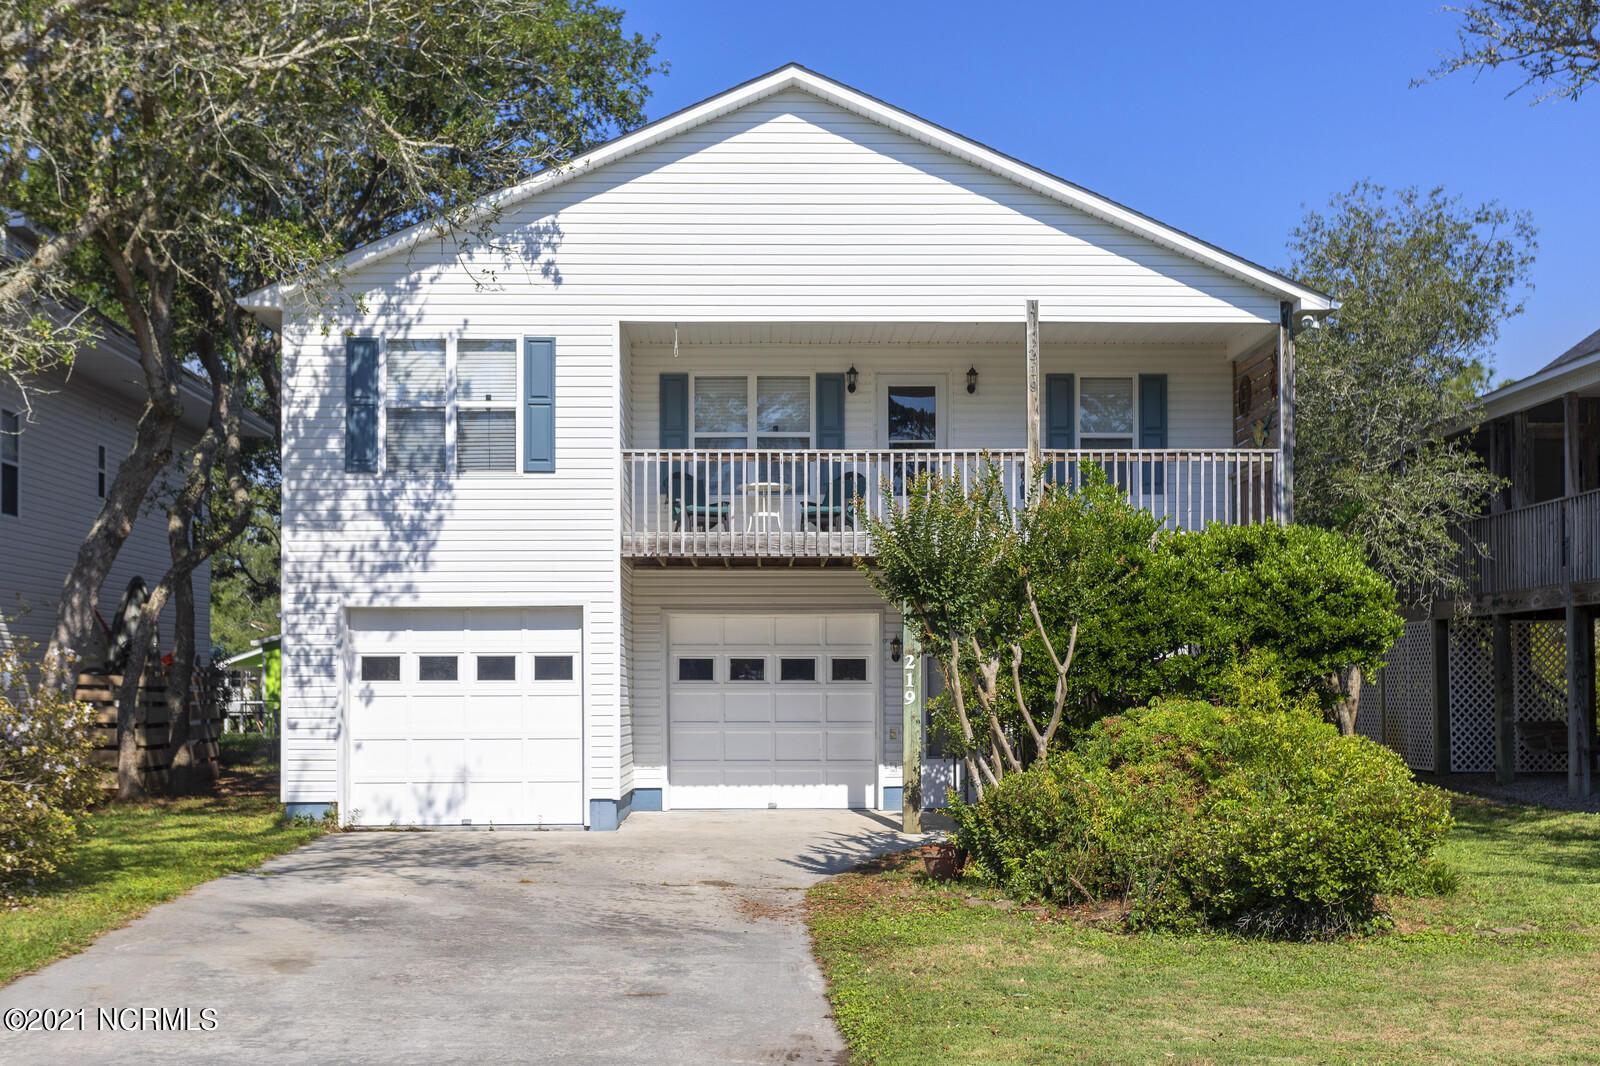 219 NE 61st Street Oak Island, NC 28465